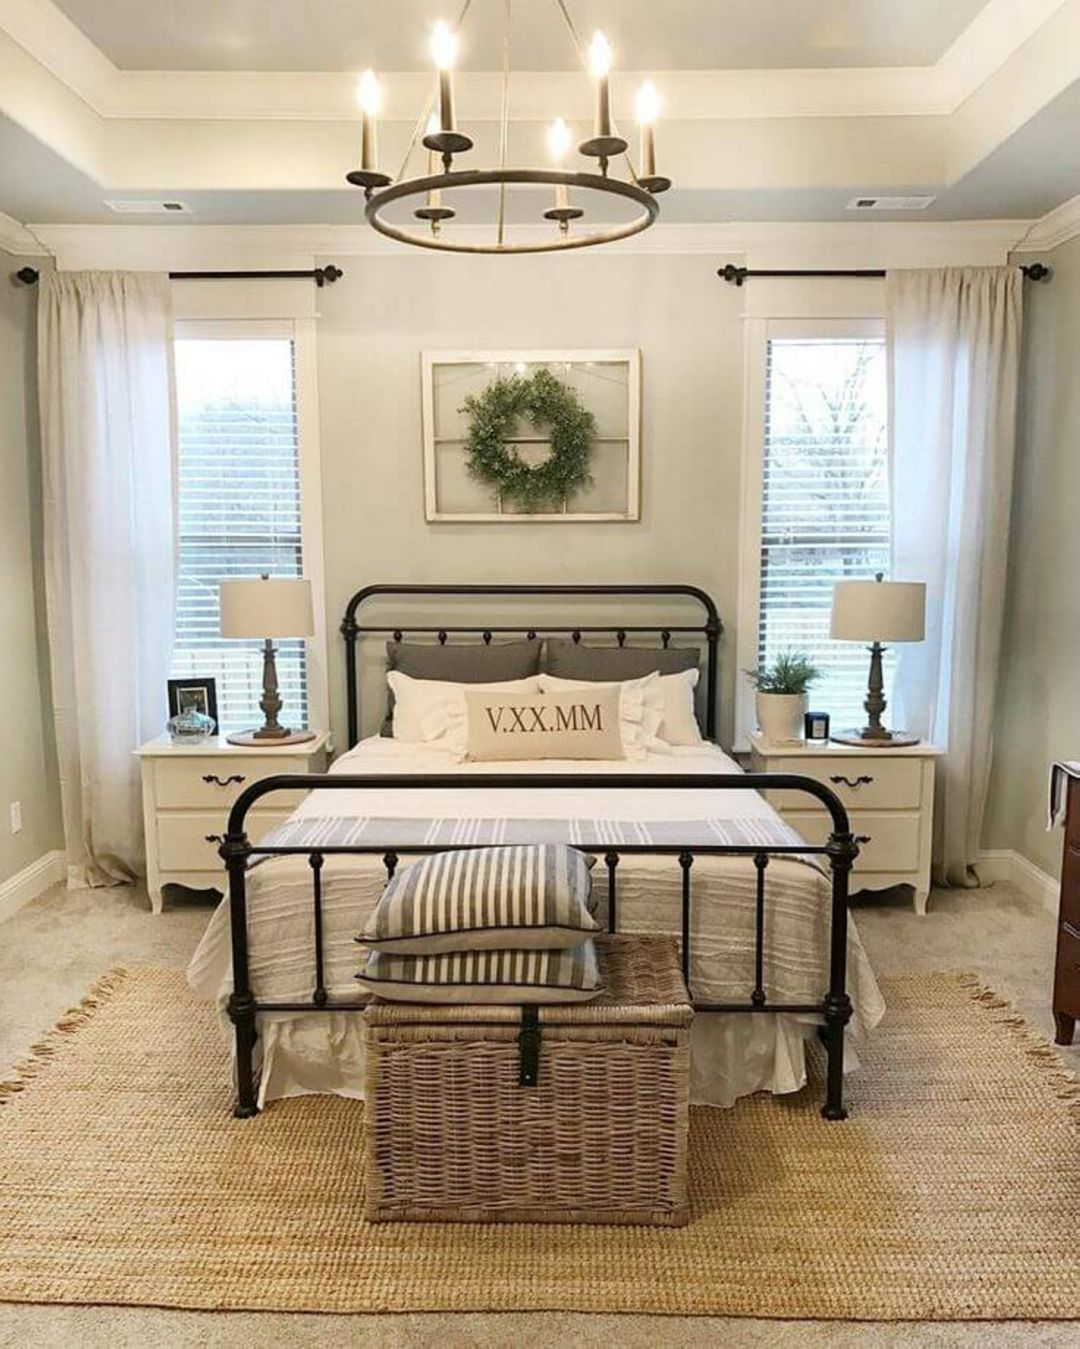 10 Gorgeous Farmhouse Bedroom Design Ideas For For Your Comfortable Sleep Farmhouse Style Master Bedroom Farmhouse Bedroom Decor Remodel Bedroom